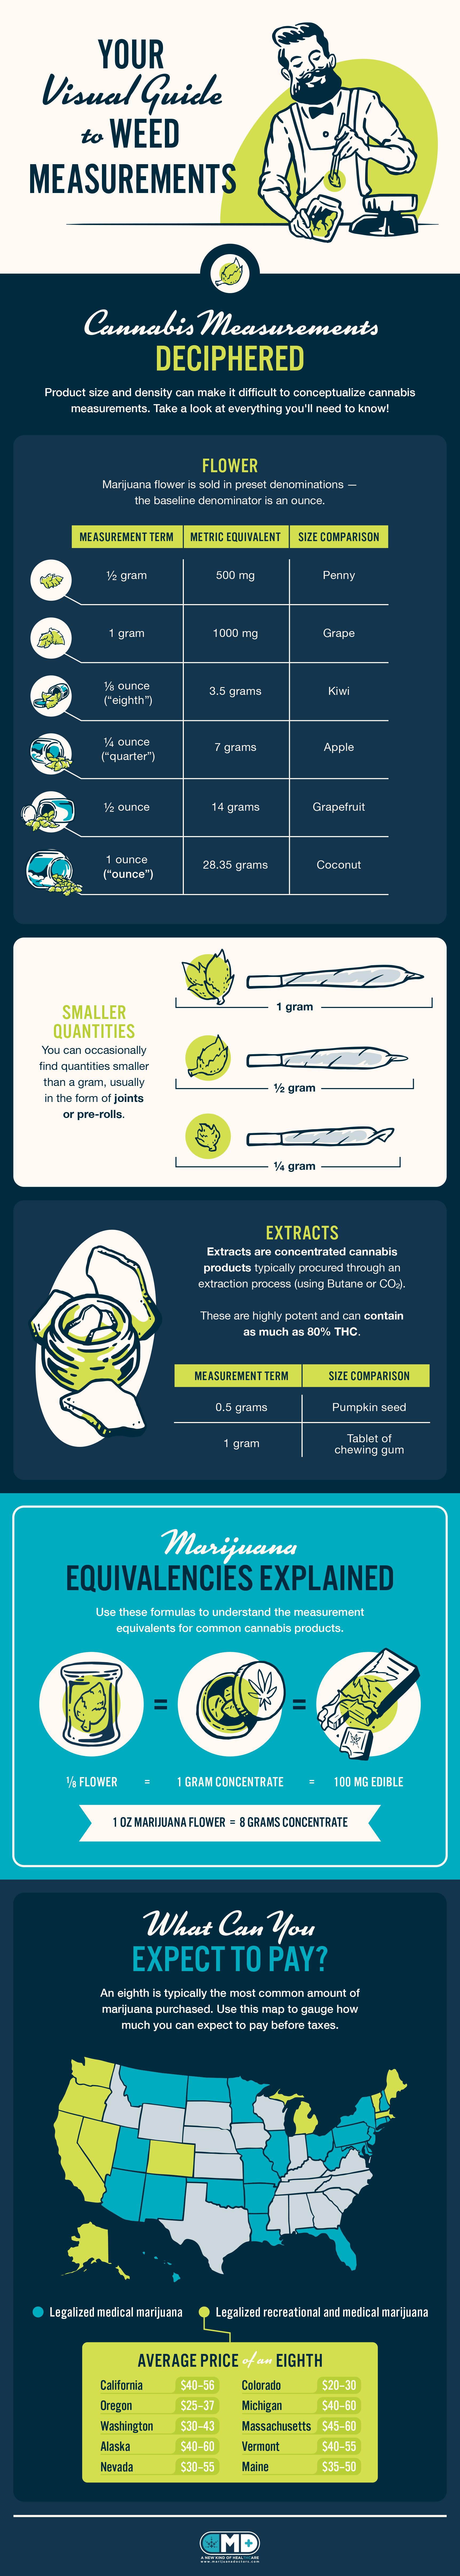 weed measurements guide